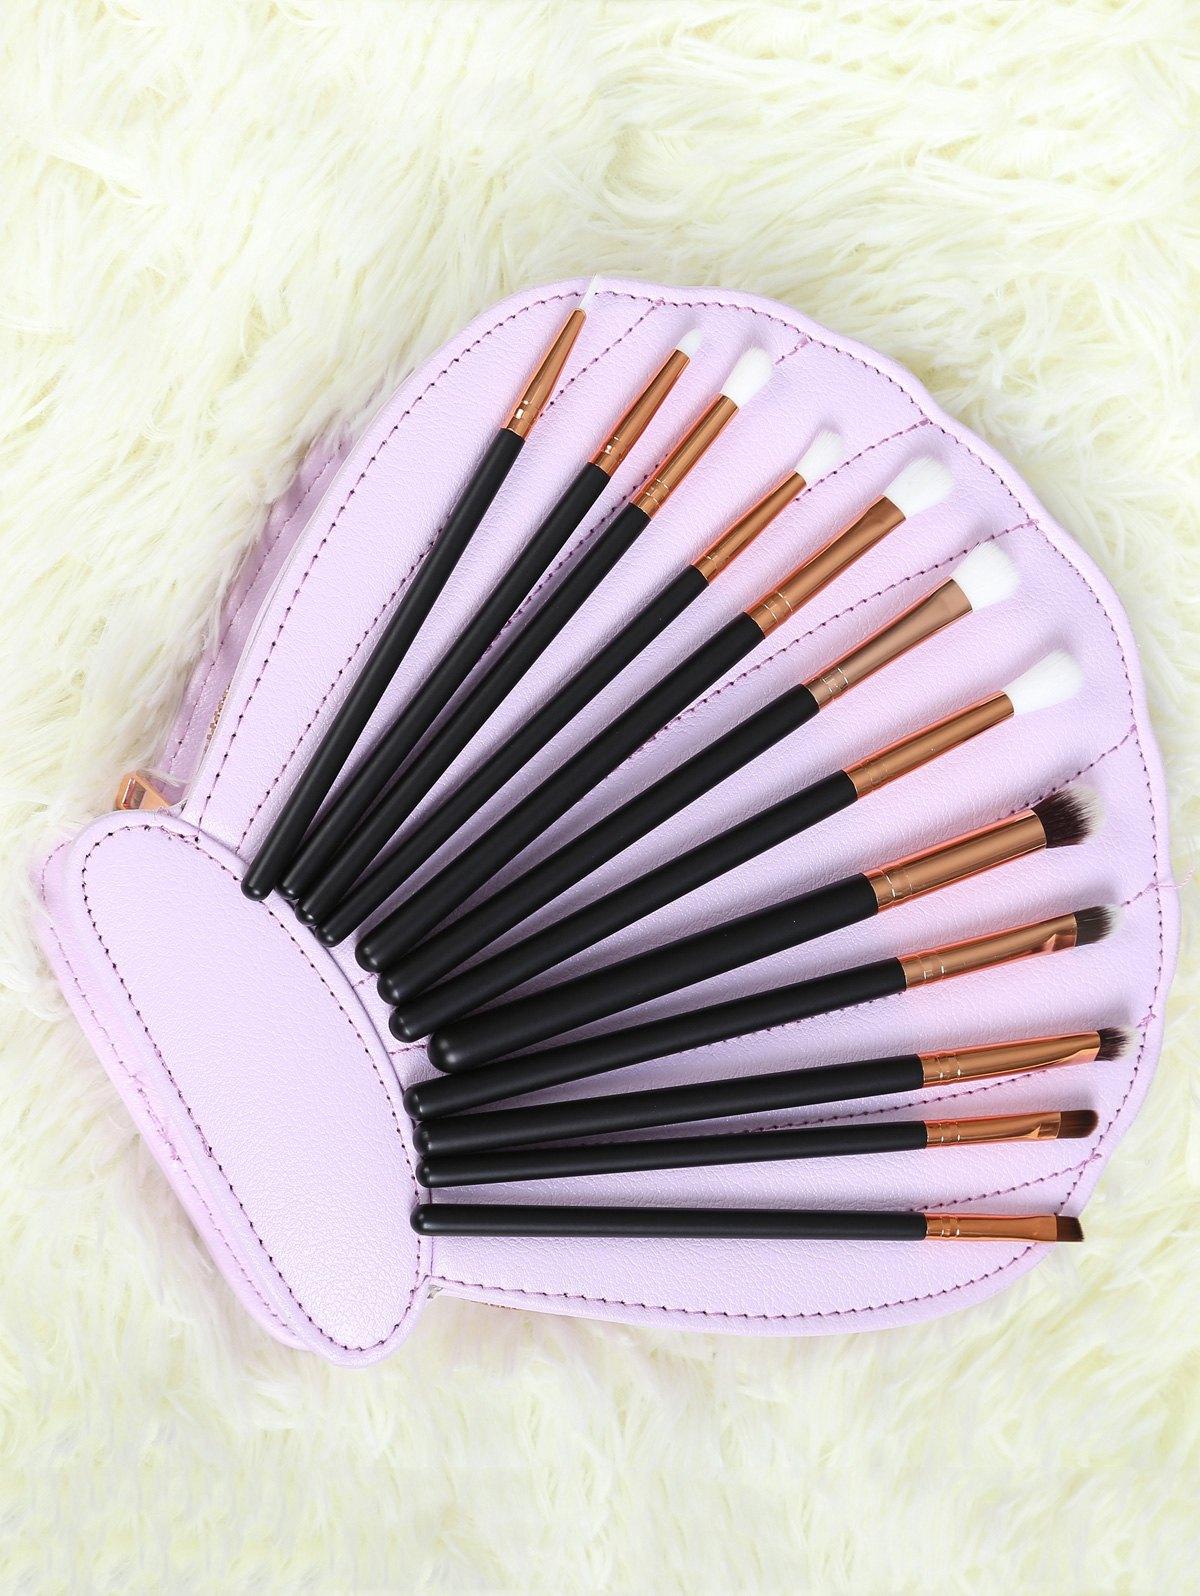 12 Pcs Nylon Eye Makeup Brushes Set